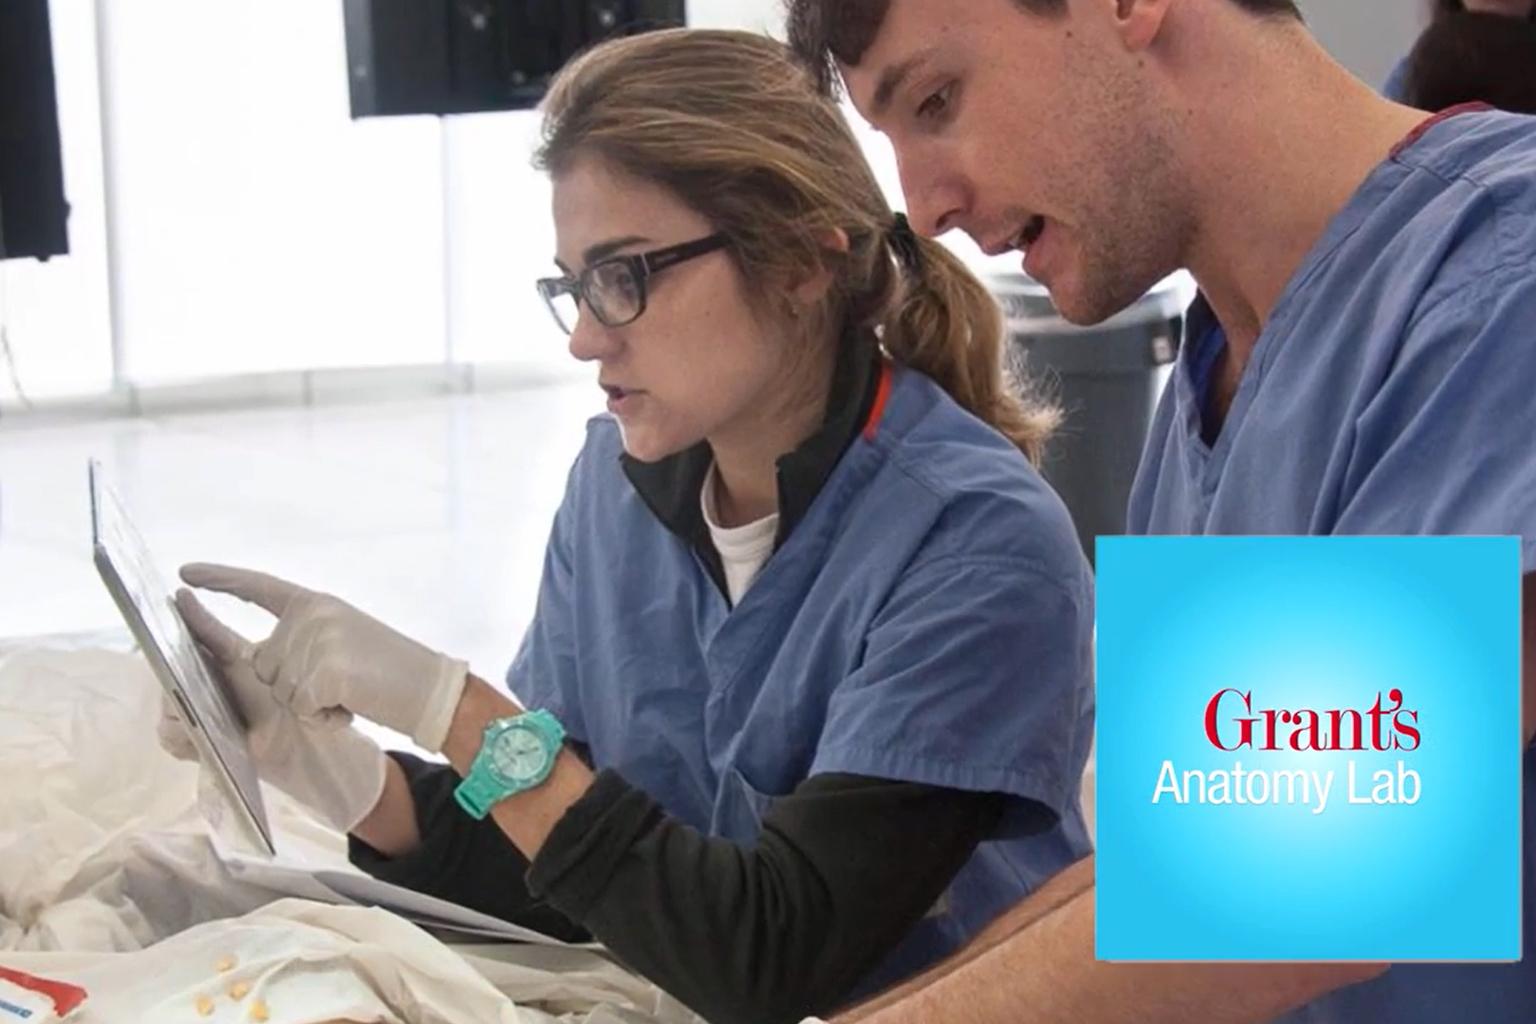 Screenshot from Grant's Anatomy Lab video